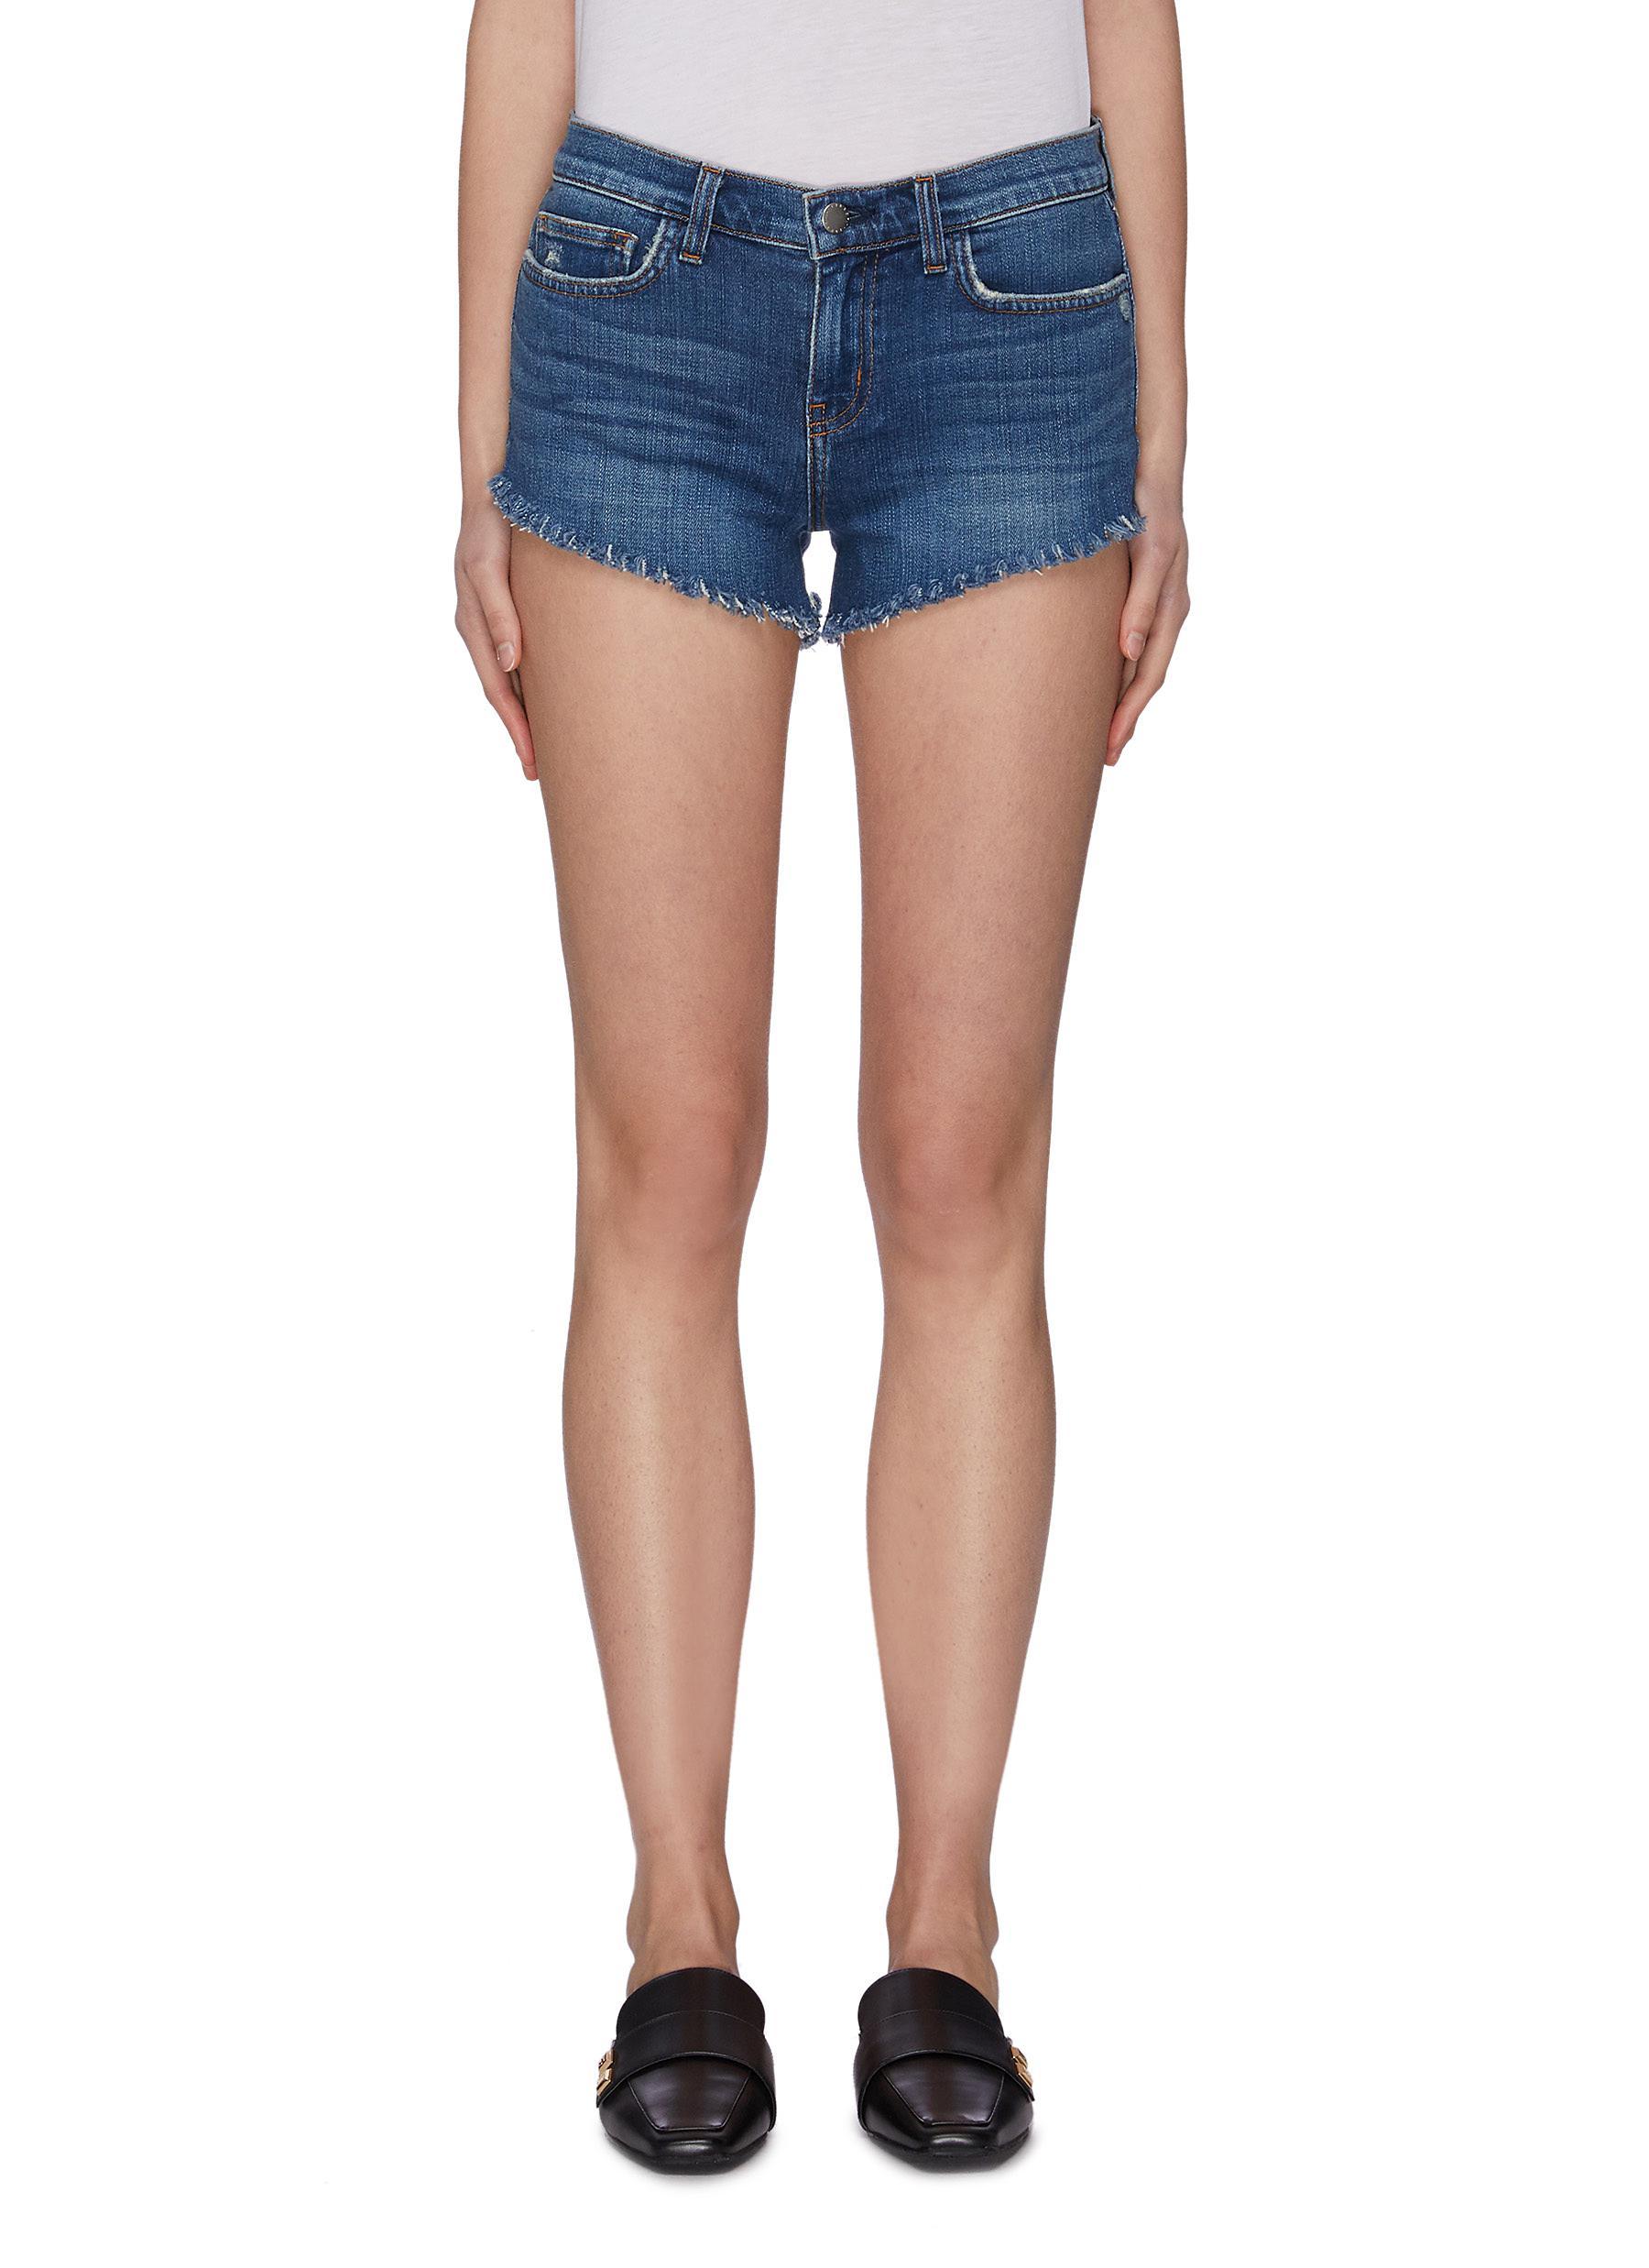 shop L'Agence 'Zoe' perfect fit frayed braided hem denim shorts online